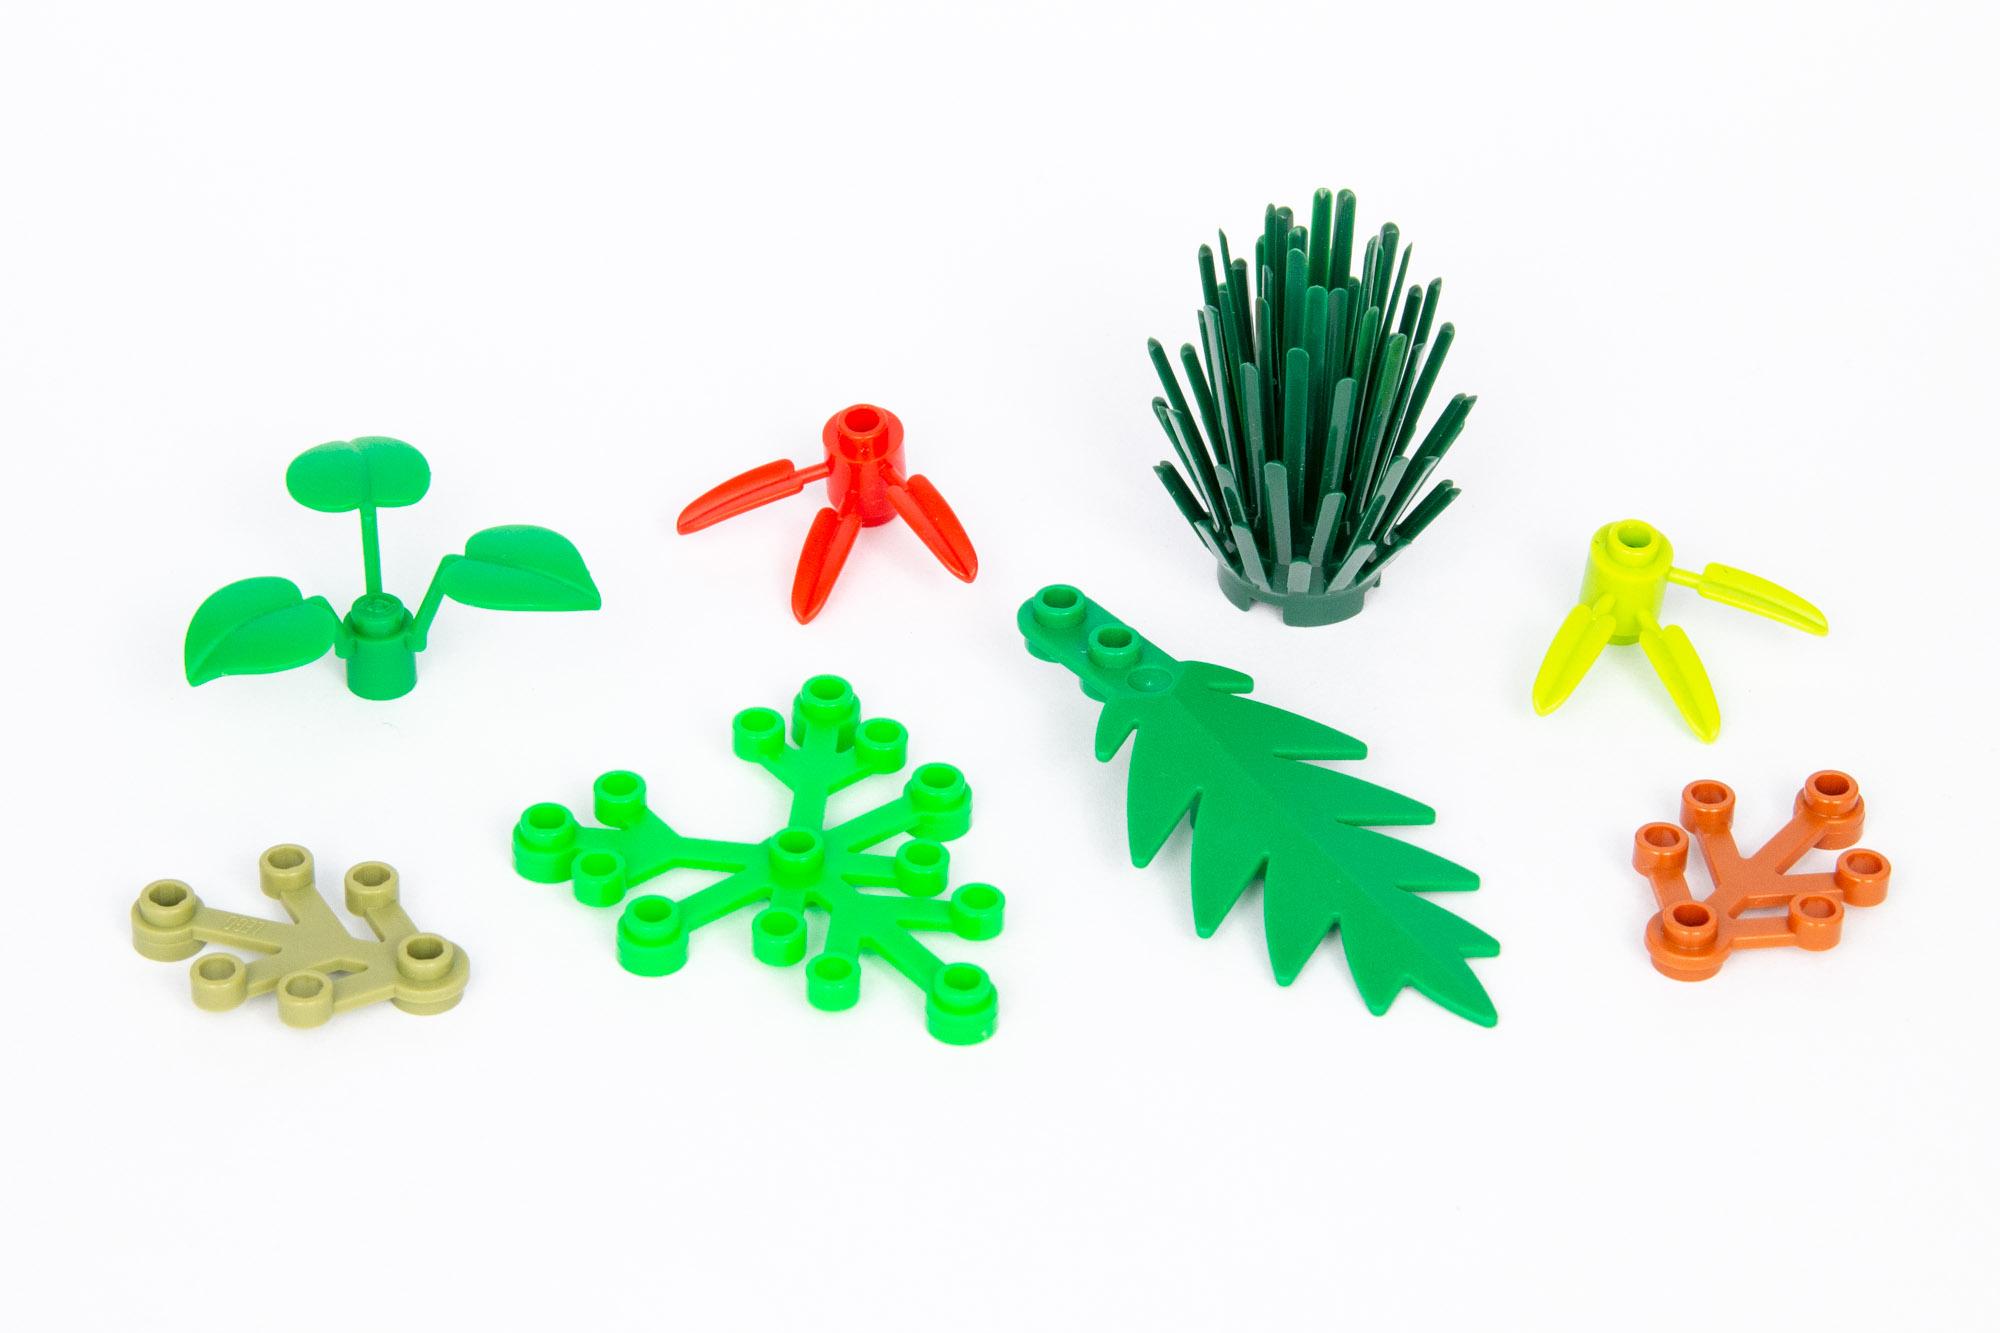 LEGO Plastik Aus Pflanzen (2)